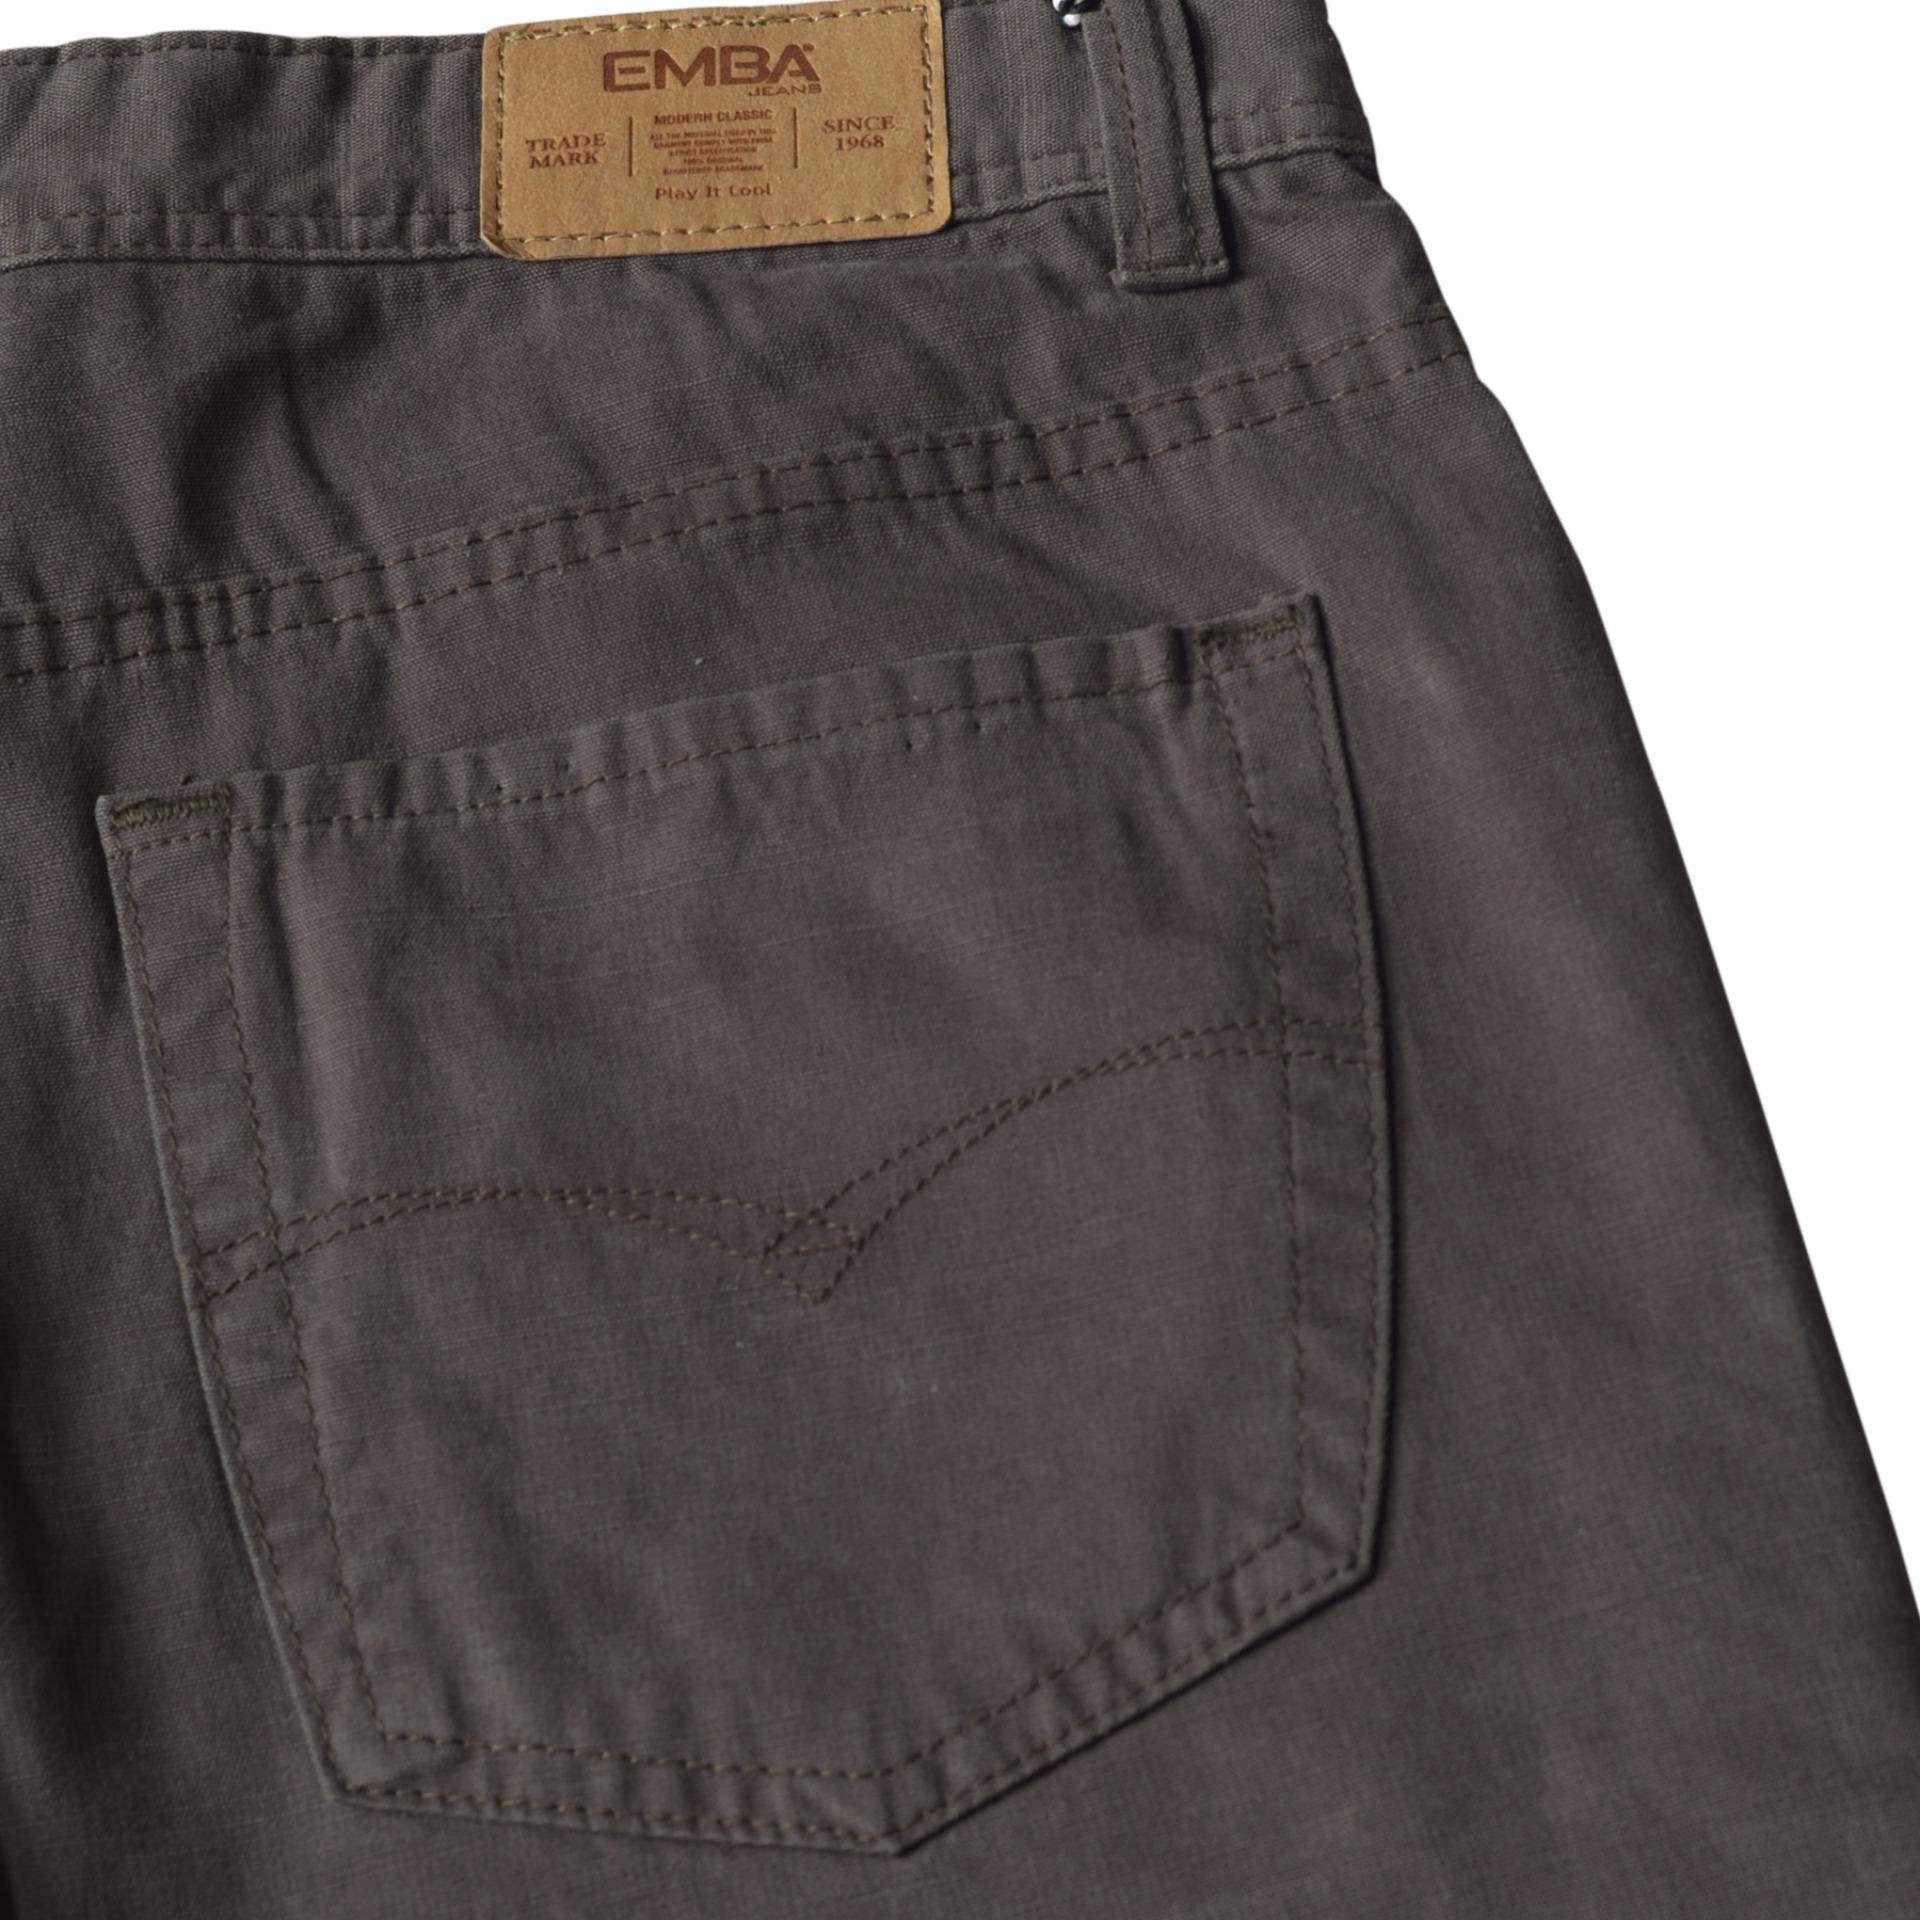 Emba Jeans Celana Panjang Pria Bs 08 Jordan Regular Black Cek Fm328 Basic Upd Warna Heavy Stom Navy 27 Brown 5